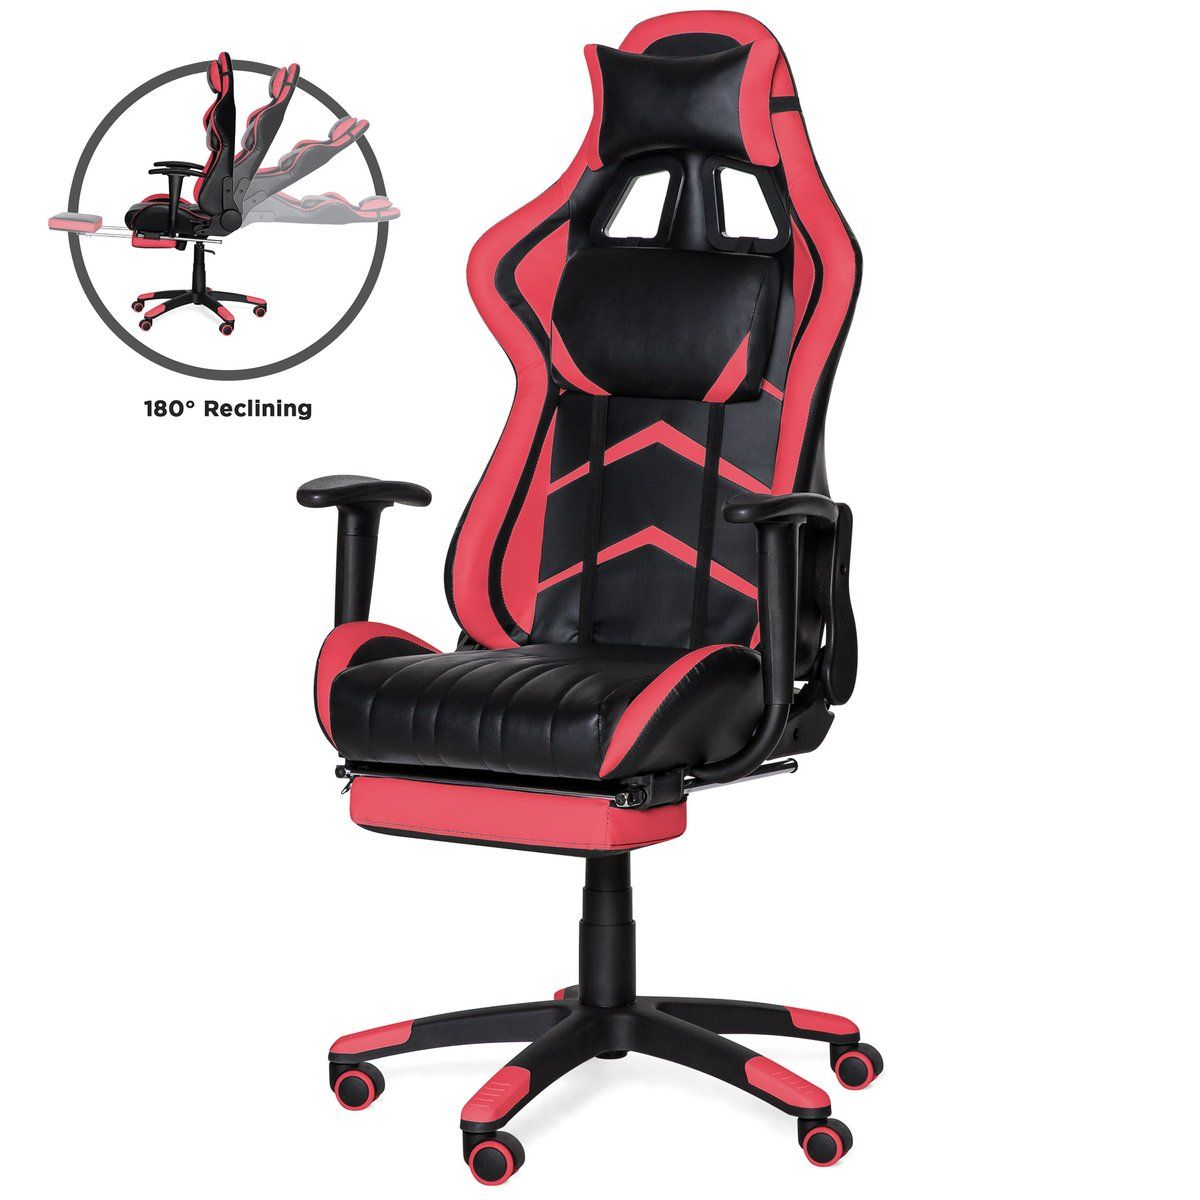 95252fe24b181fa7df188d134c1435d4 - How To Get Out Of Chair In Black Ops